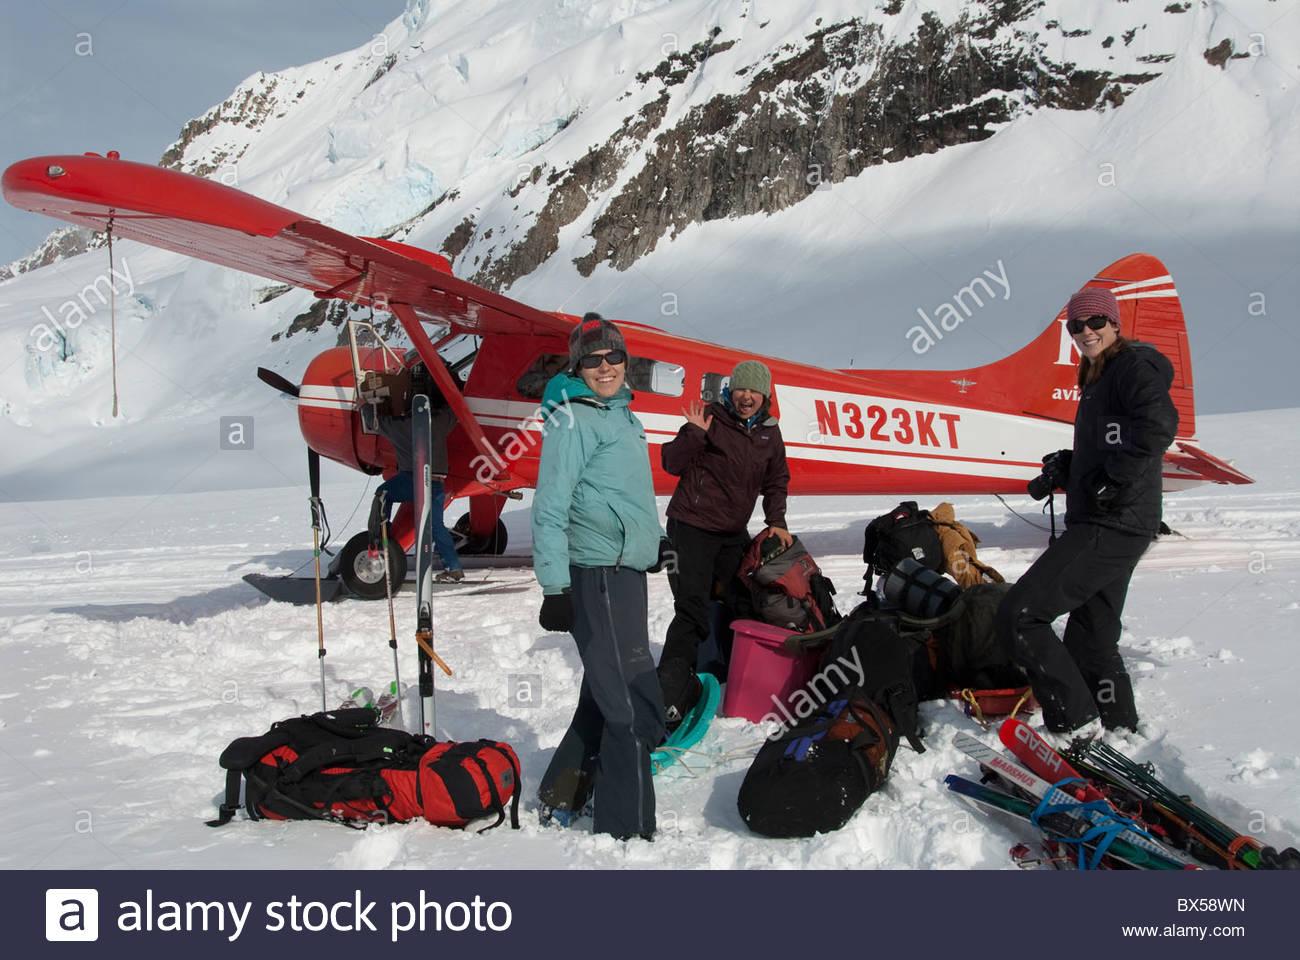 Denali National Park, Alaska. Ruth Ampitheater. K2 Aviation plane departing from the Don Sheldon Hut landing strip - Stock Image